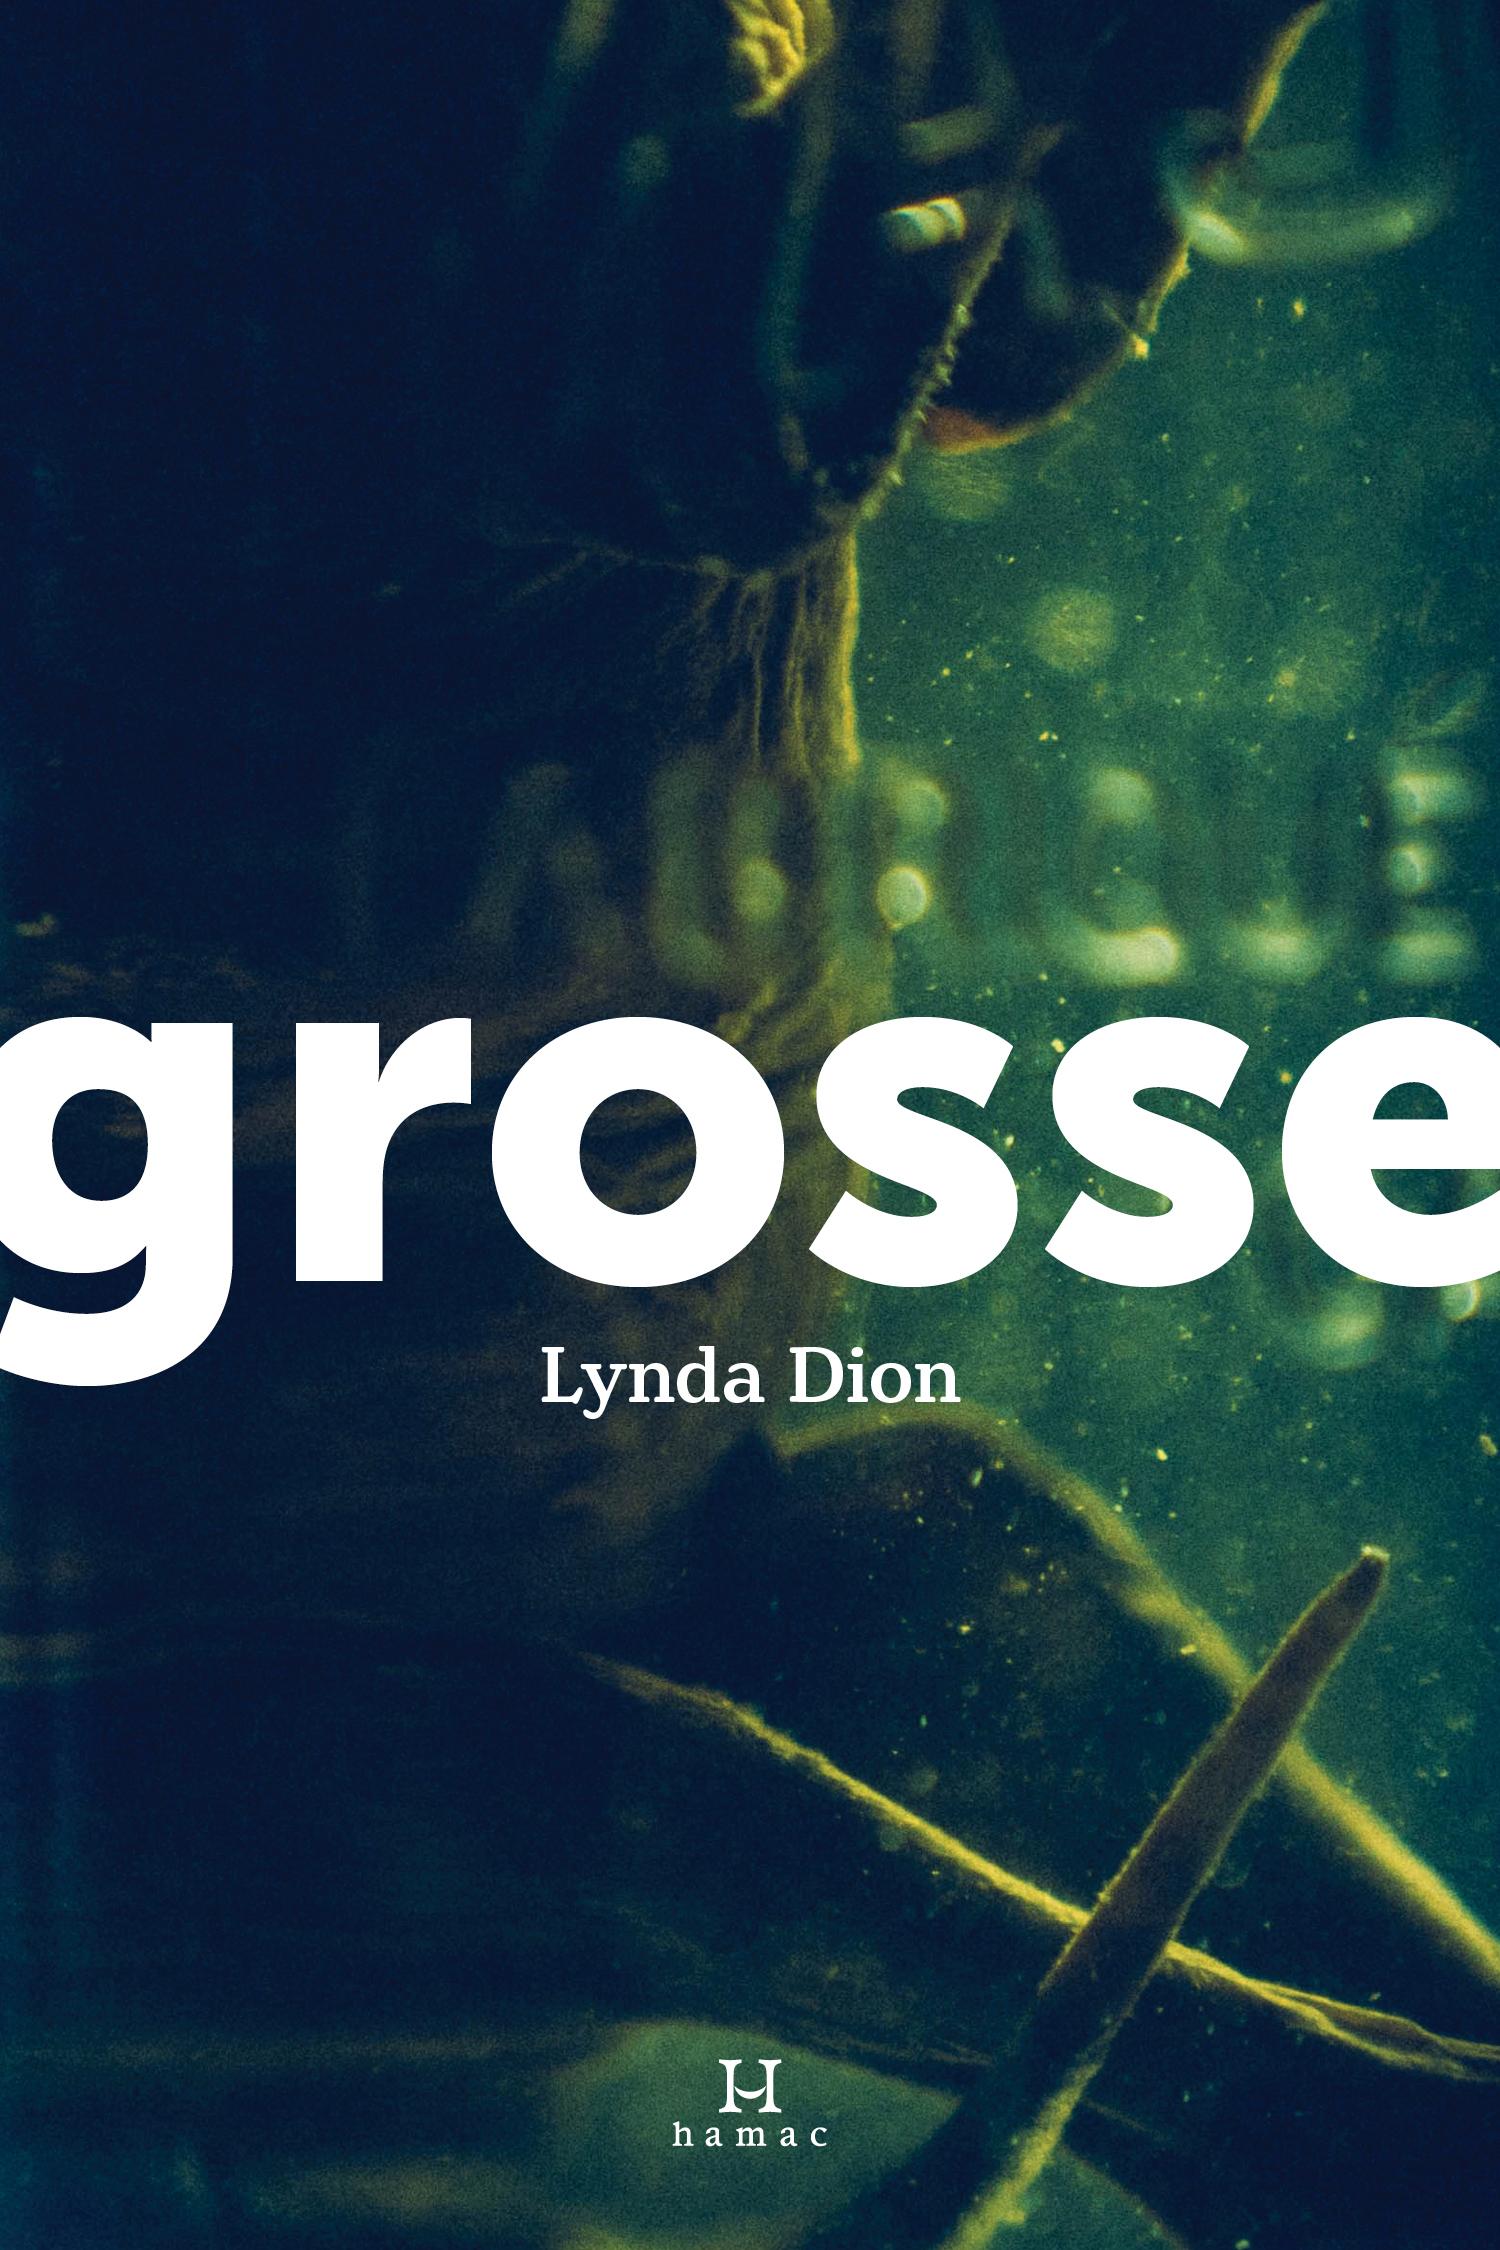 Couverture : Grosse Lynda Dion